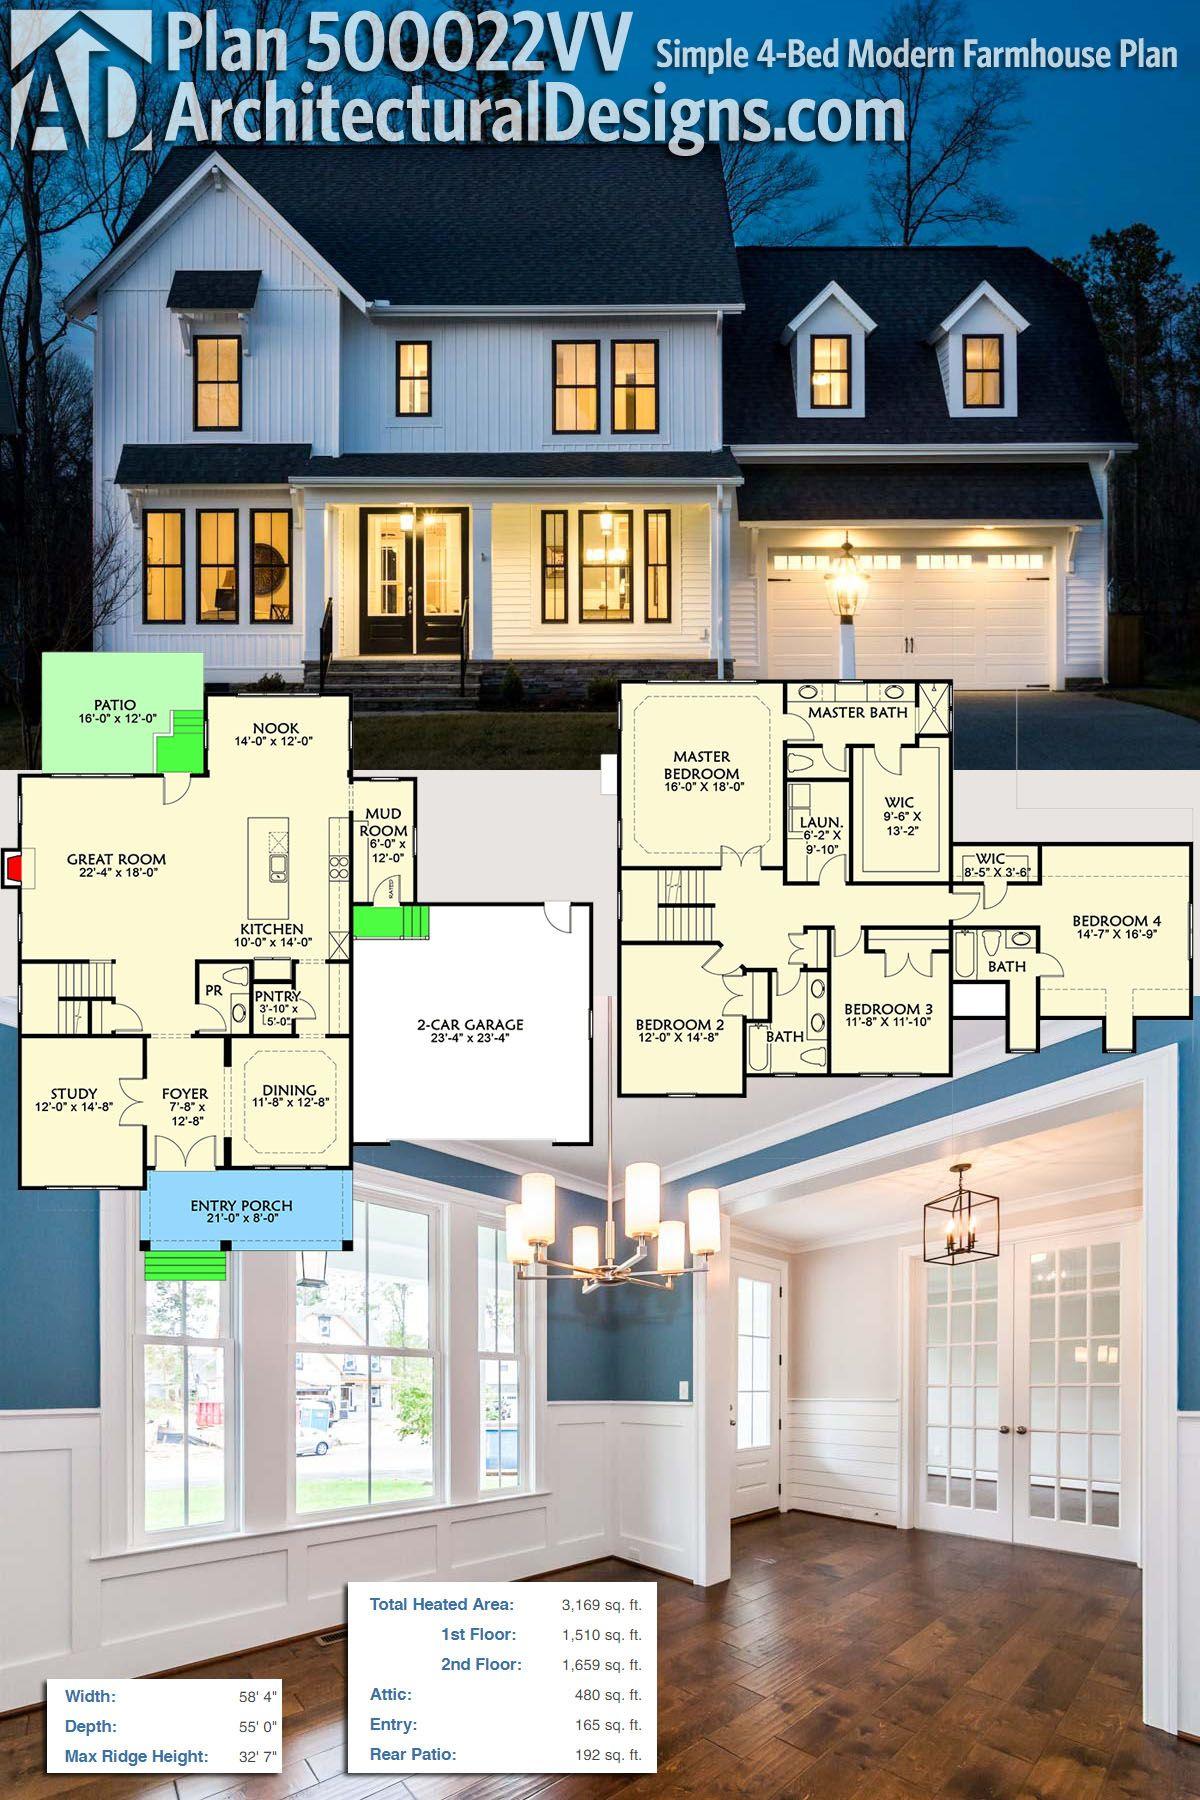 Plan vv simple bedroom modern farmhouse plan farmhouse